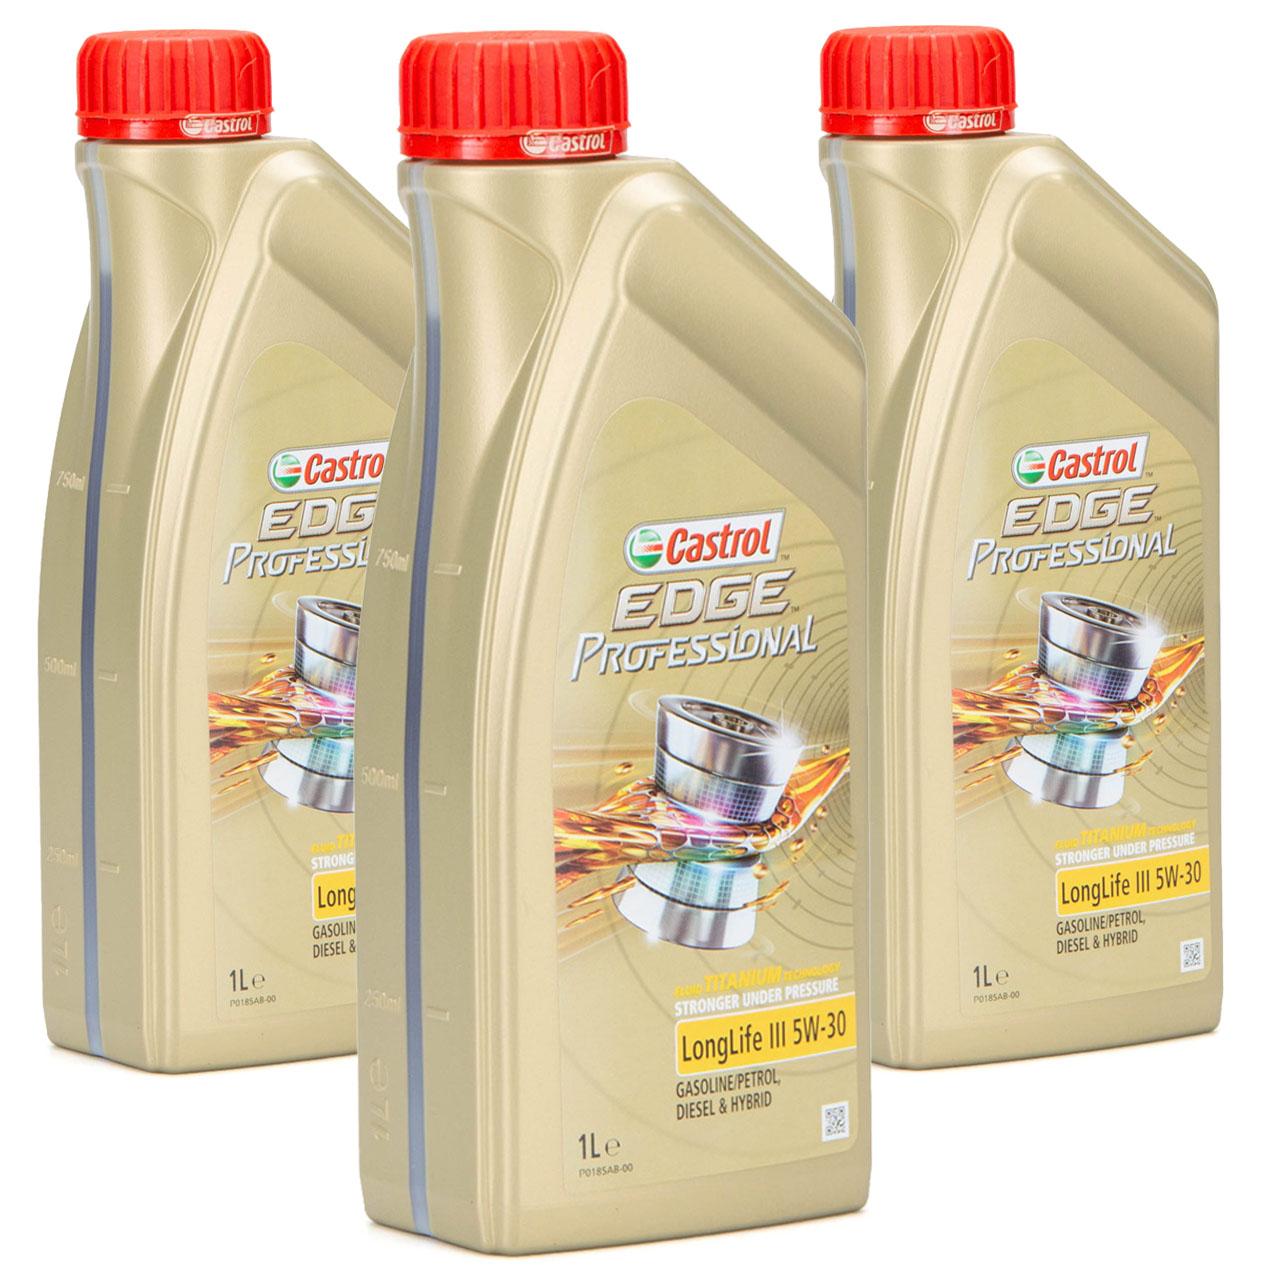 CASTROL EDGE Professional Motoröl Öl TITANIUM LongLife III 5W-30 5W30 - 3 Liter